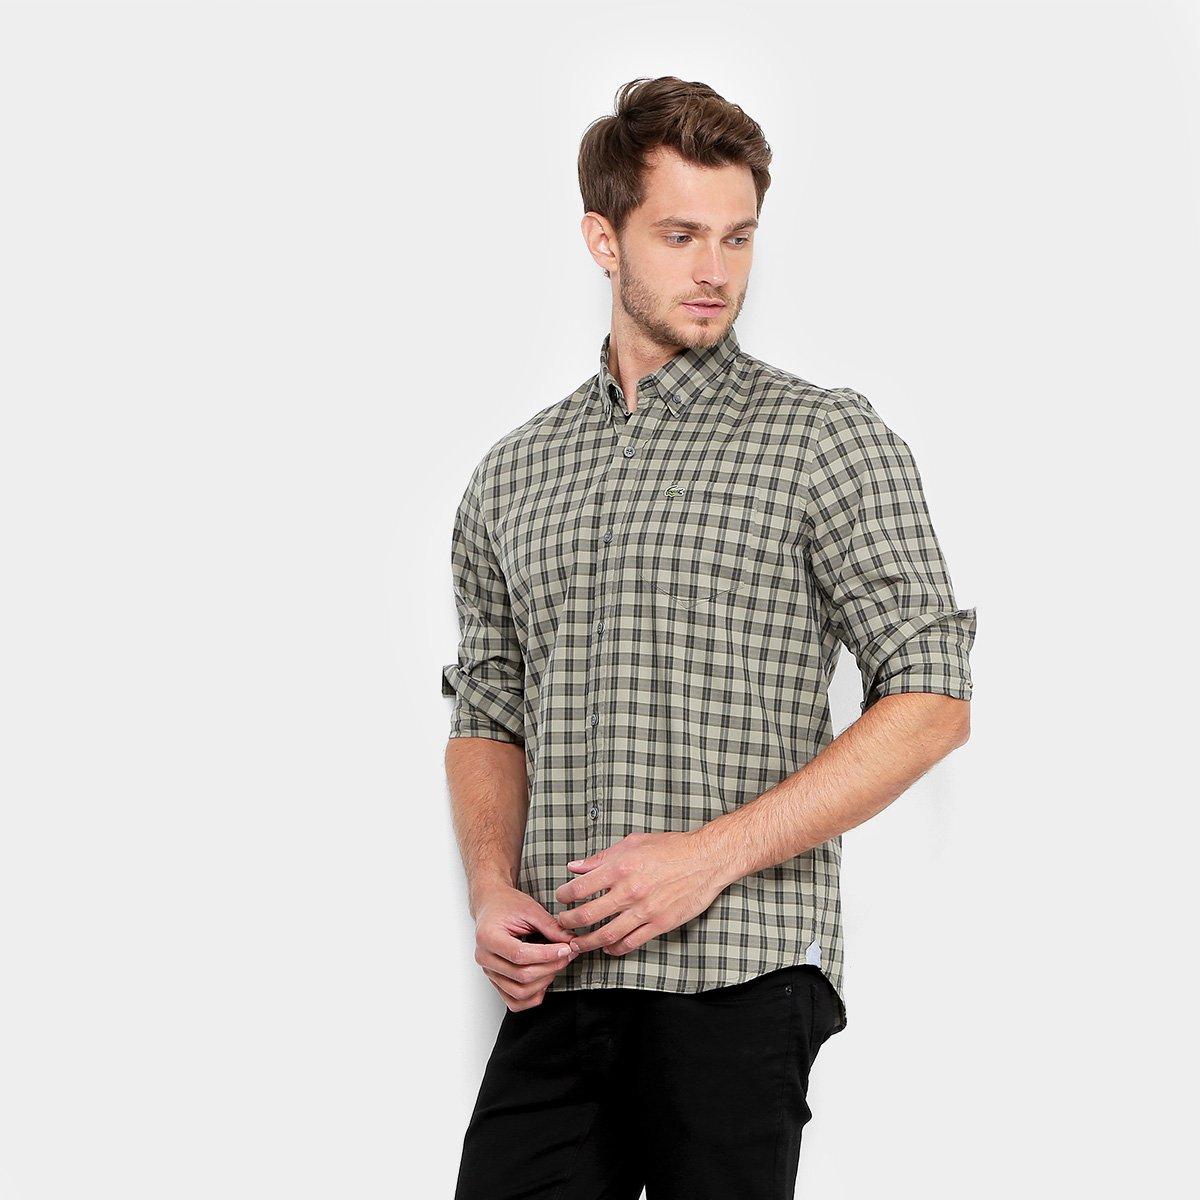 1f71df45c753c Camisa Lacoste Xadrez Regular Fit Bolso Masculina - Compre Agora ...